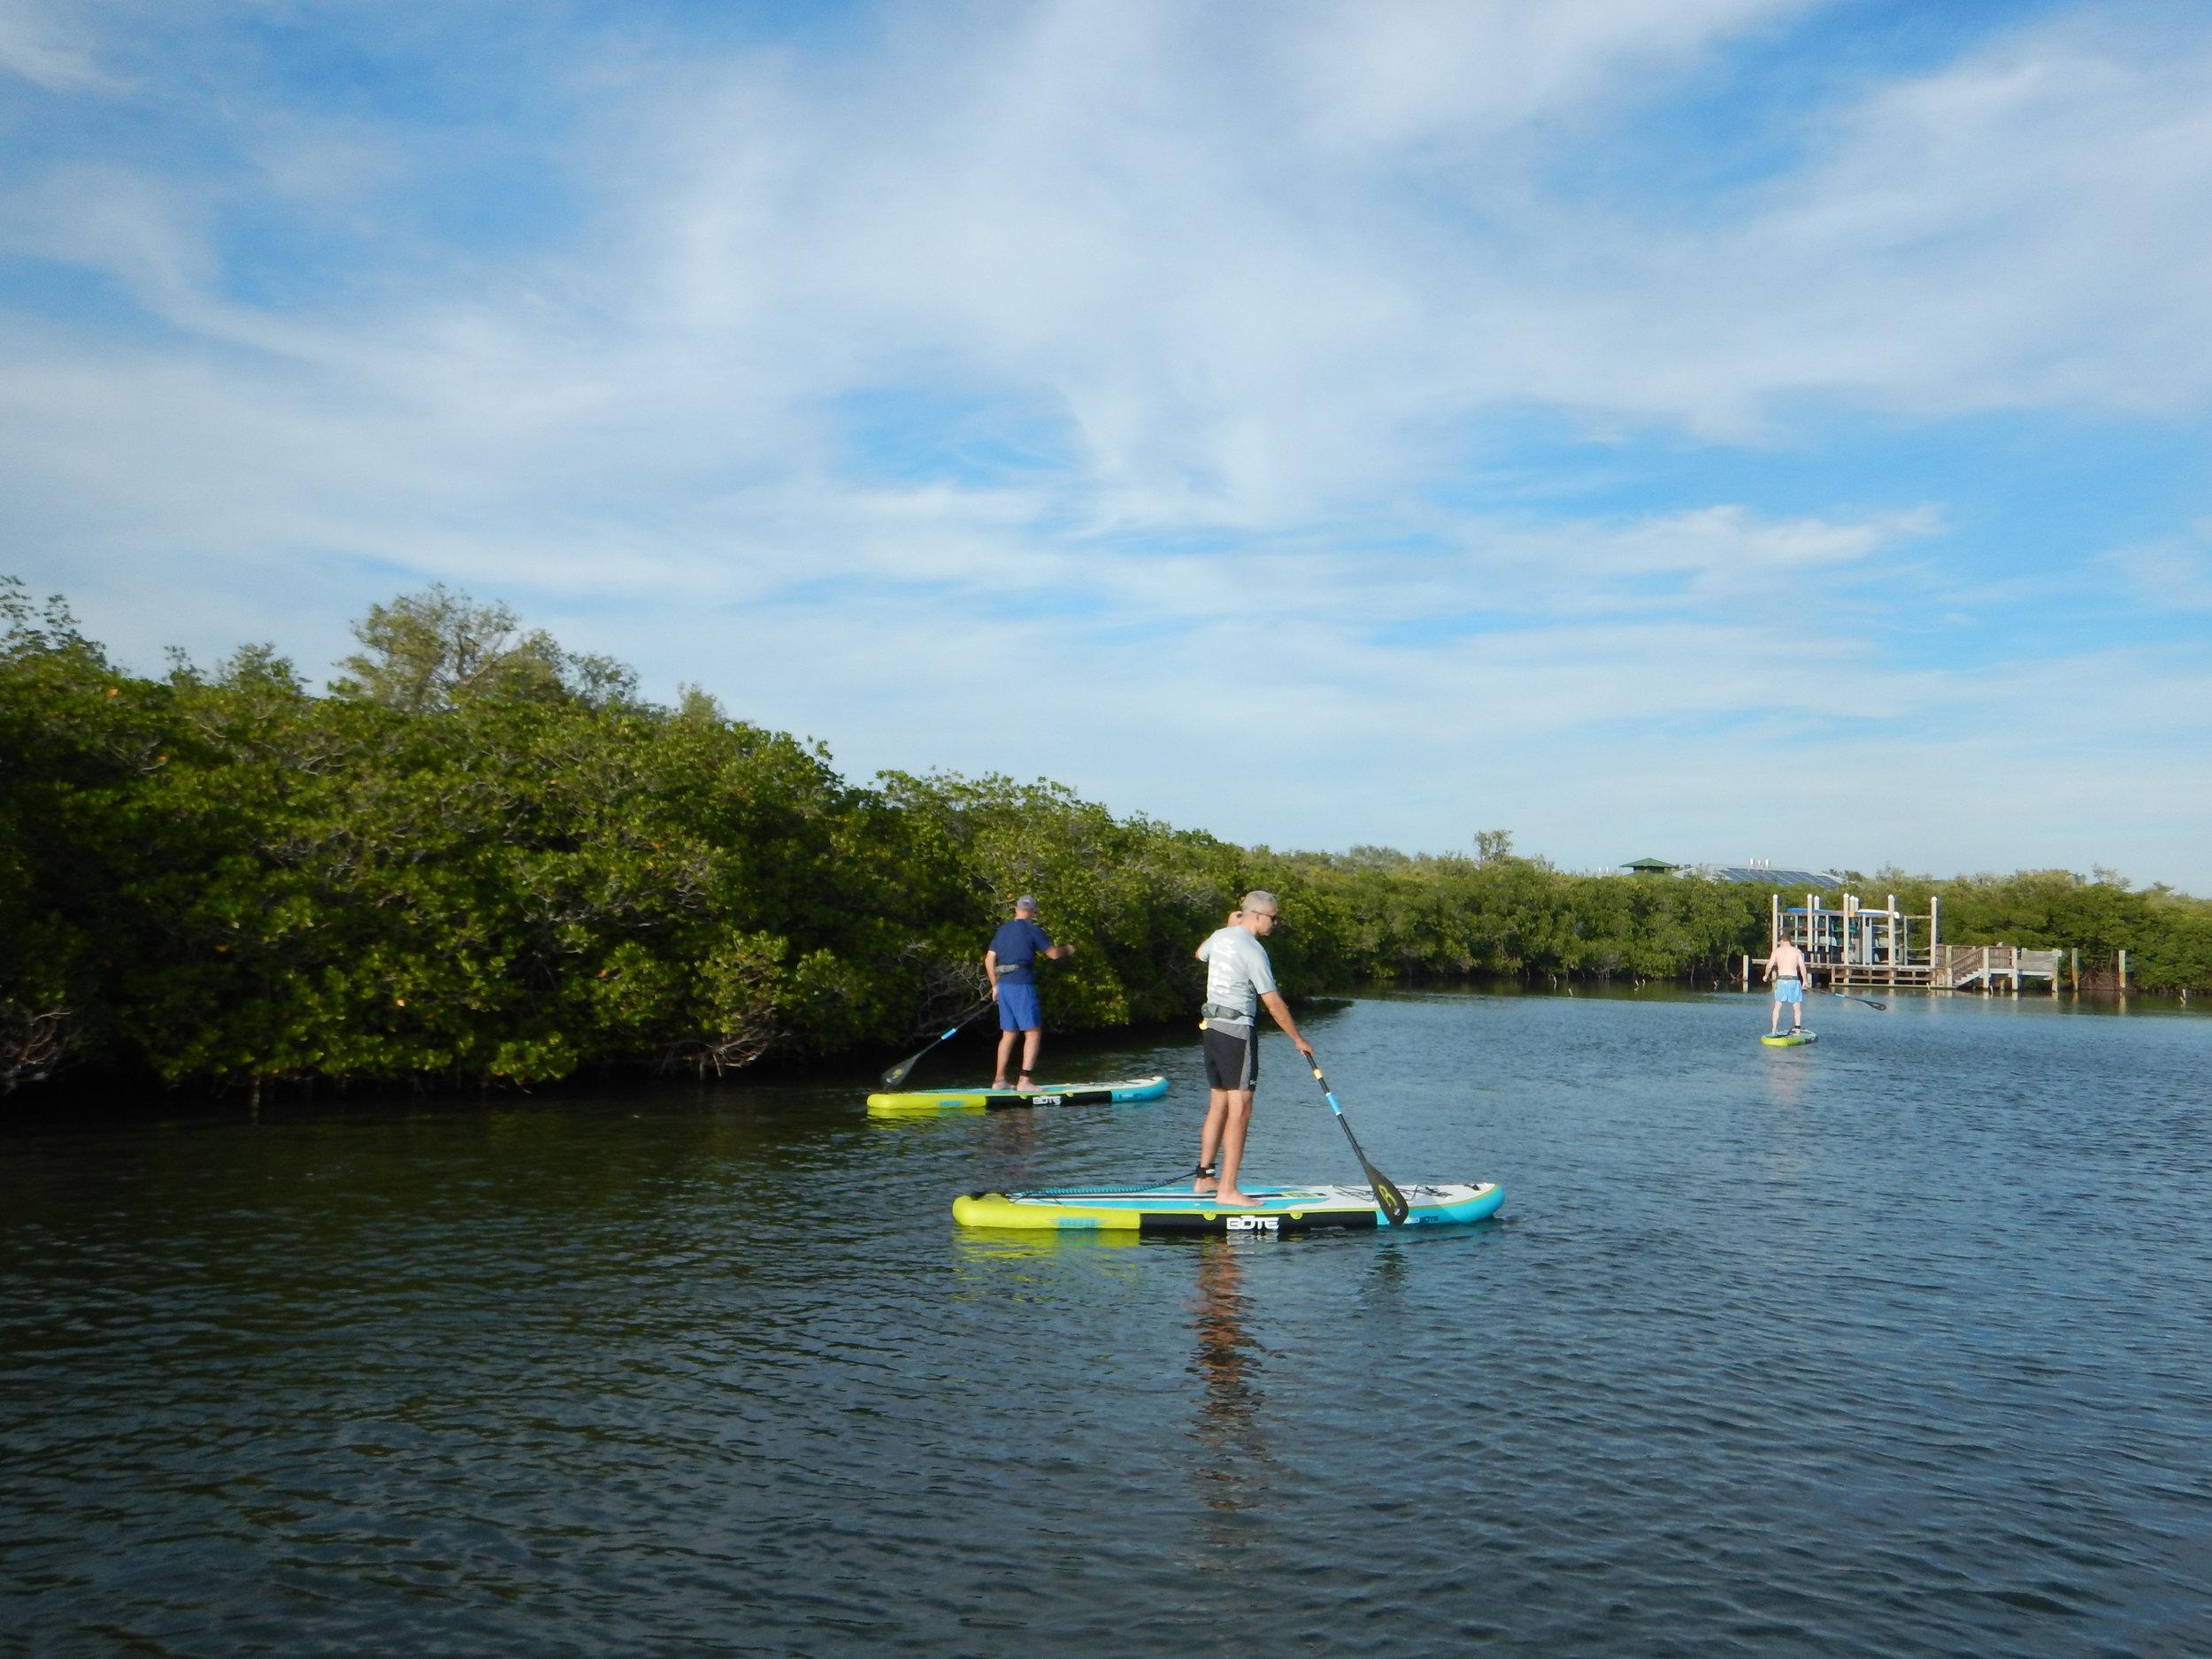 paddleboard, sea sup go, paddle vero, vero beach, paddle board tour, paddle board vero, paddleboard vero, paddleboard, paddleboarding, kayak, kayak tour, kayak vero, mangrove tour, vero tour,